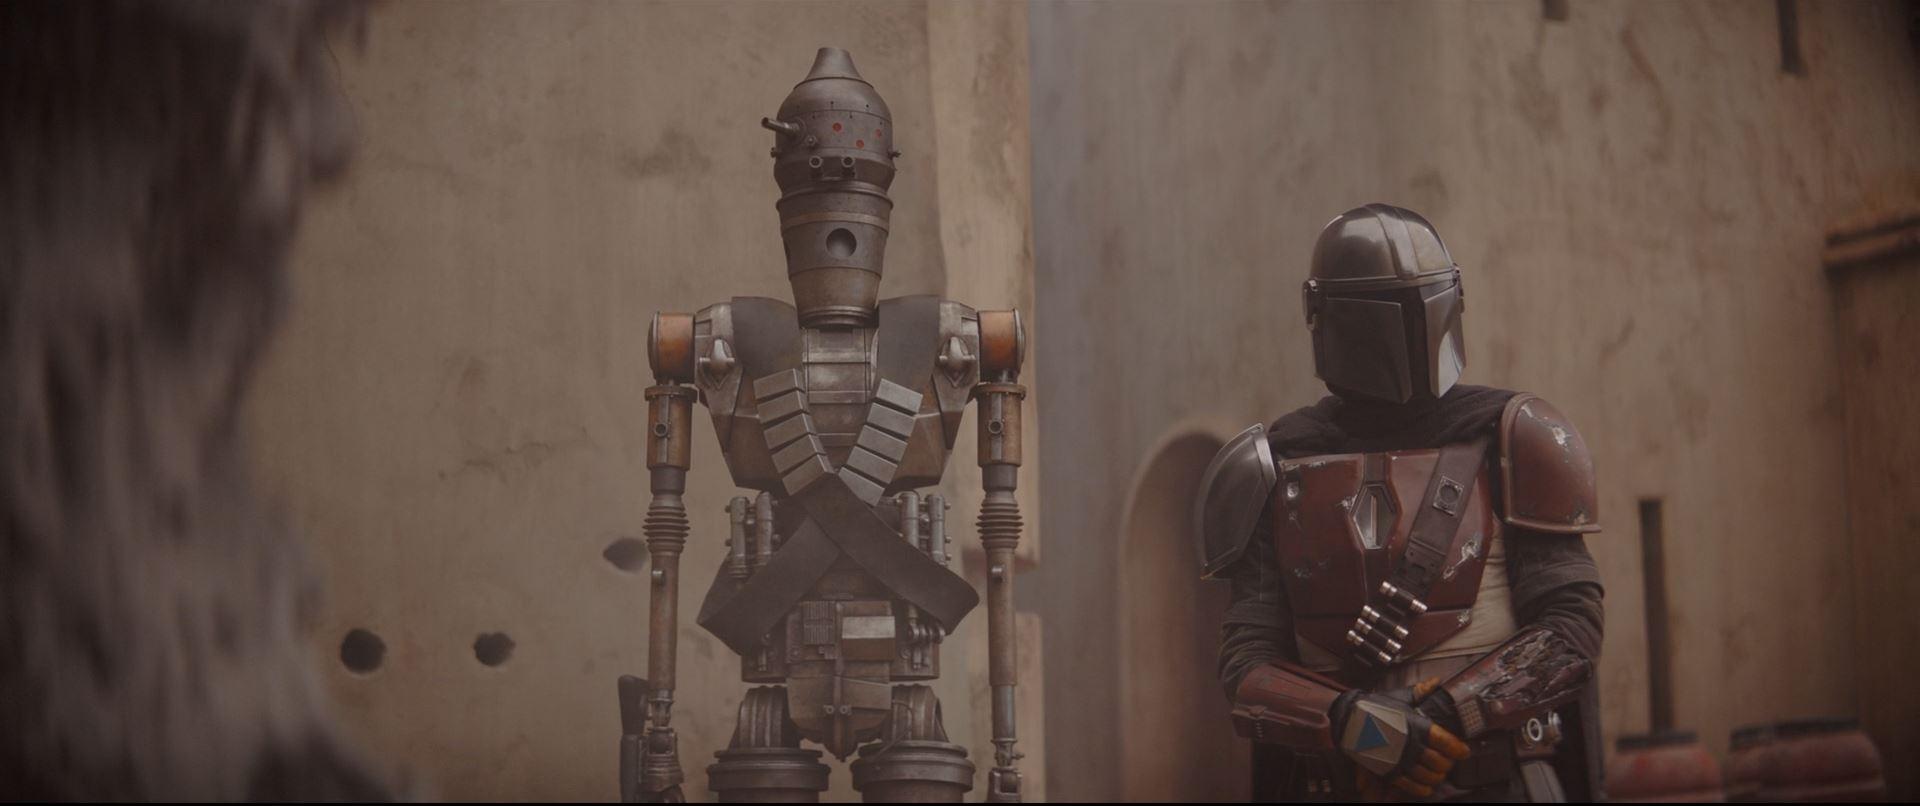 The Mandalorian - IG-11 voiced by Taika Waititi